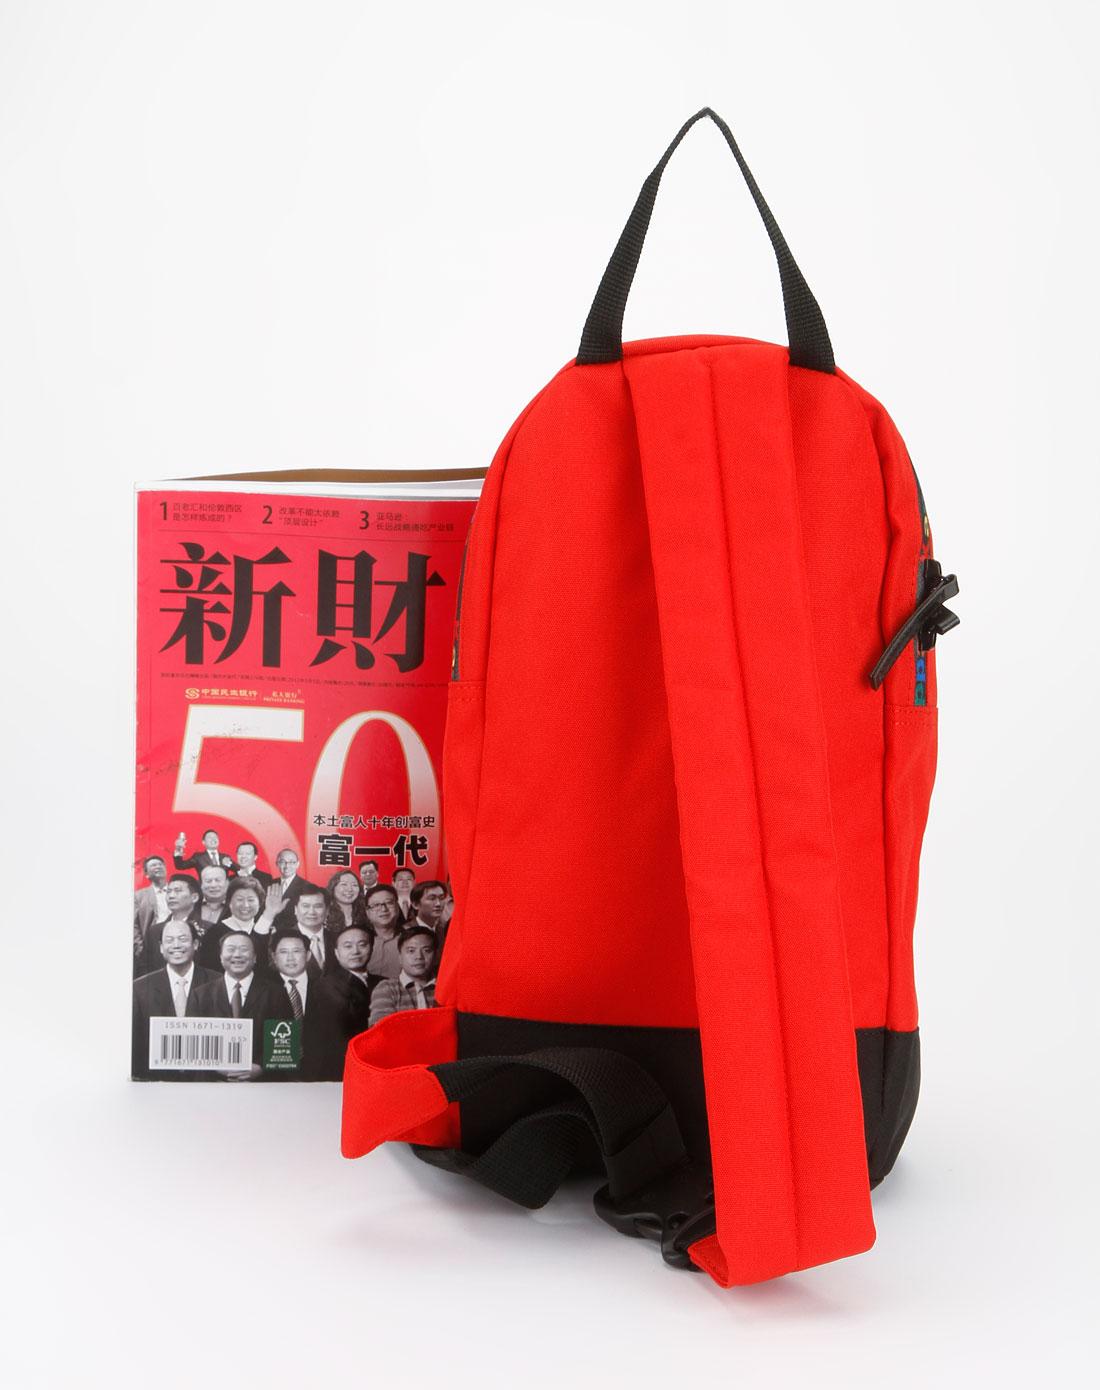 卡帕kappa红色时尚单肩包k01x8bd56-533